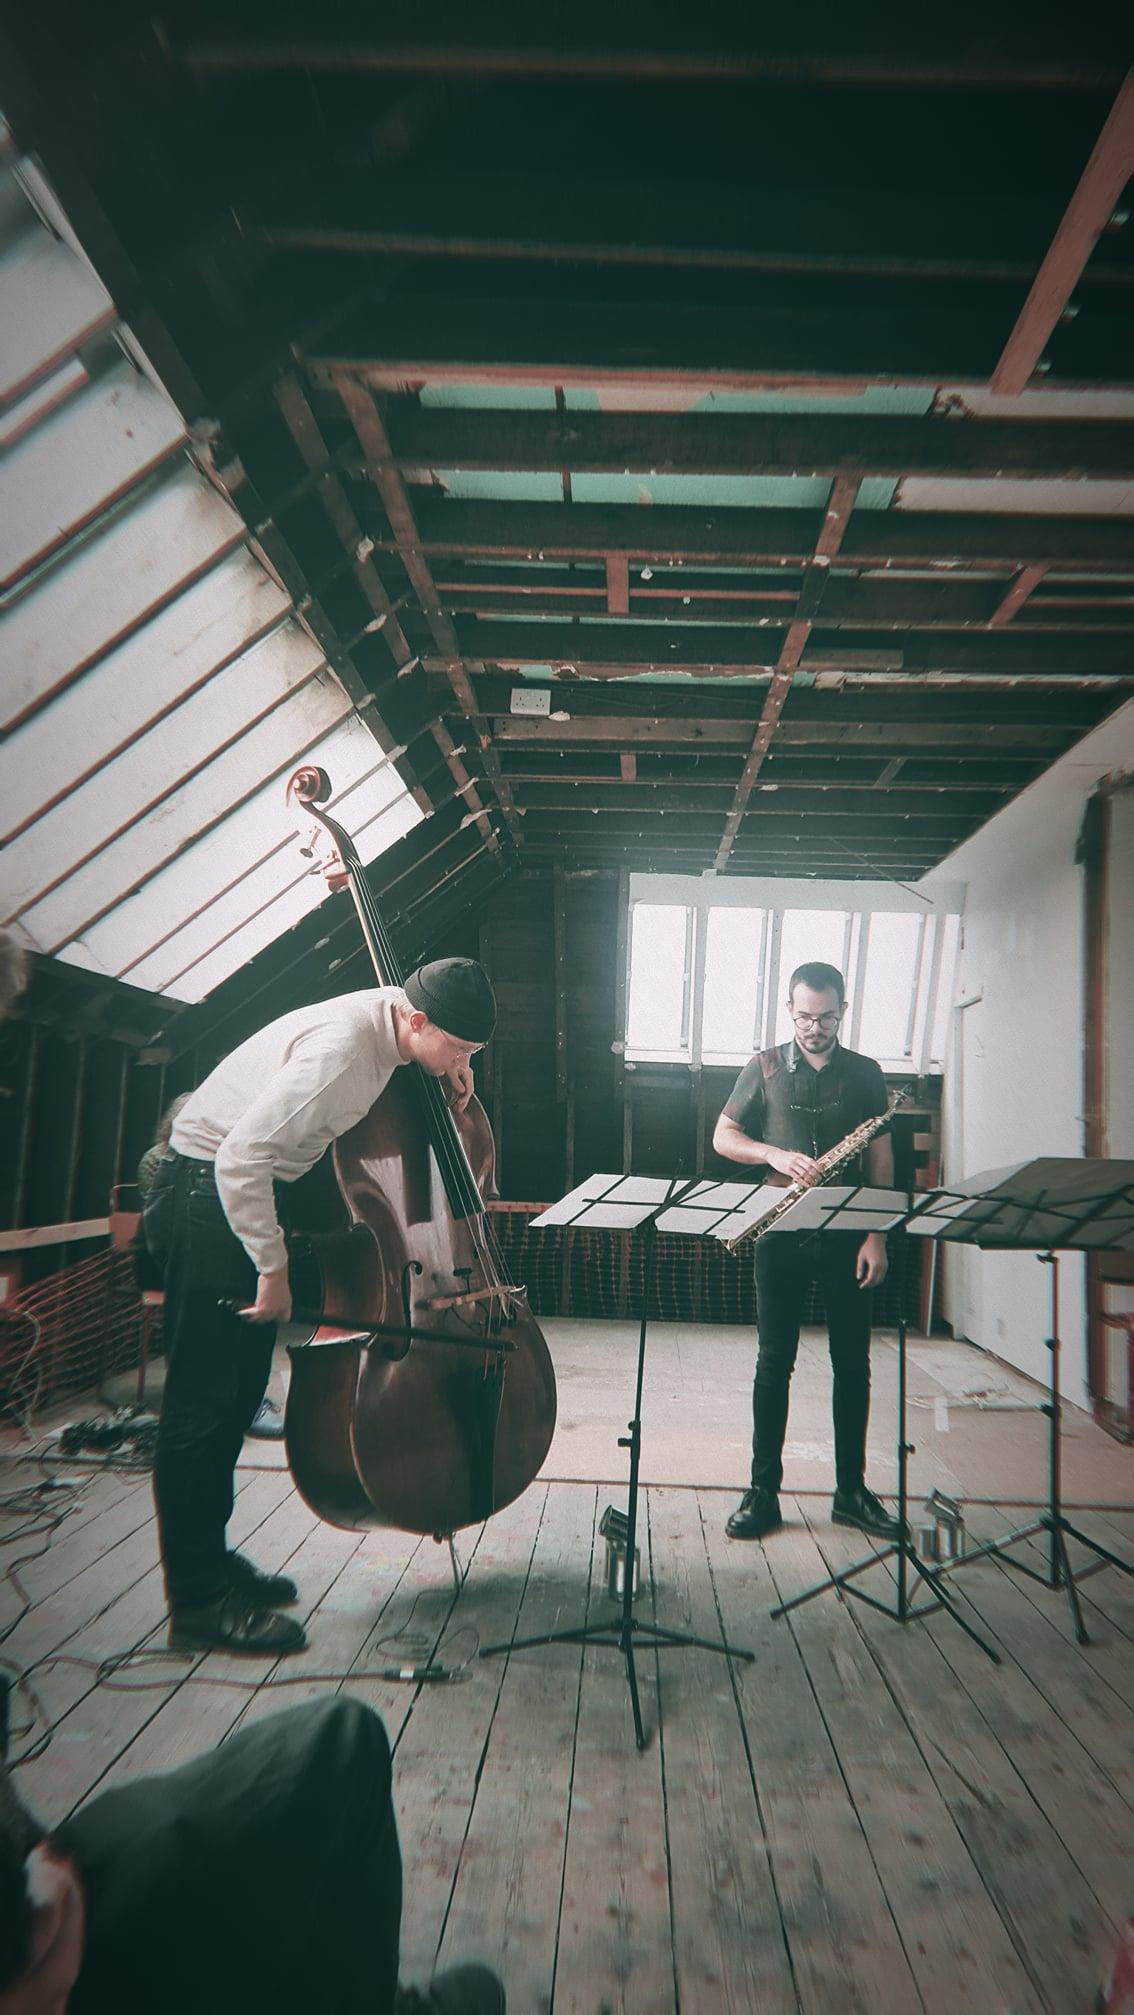 intus @ Glasgow Experimental Music Series